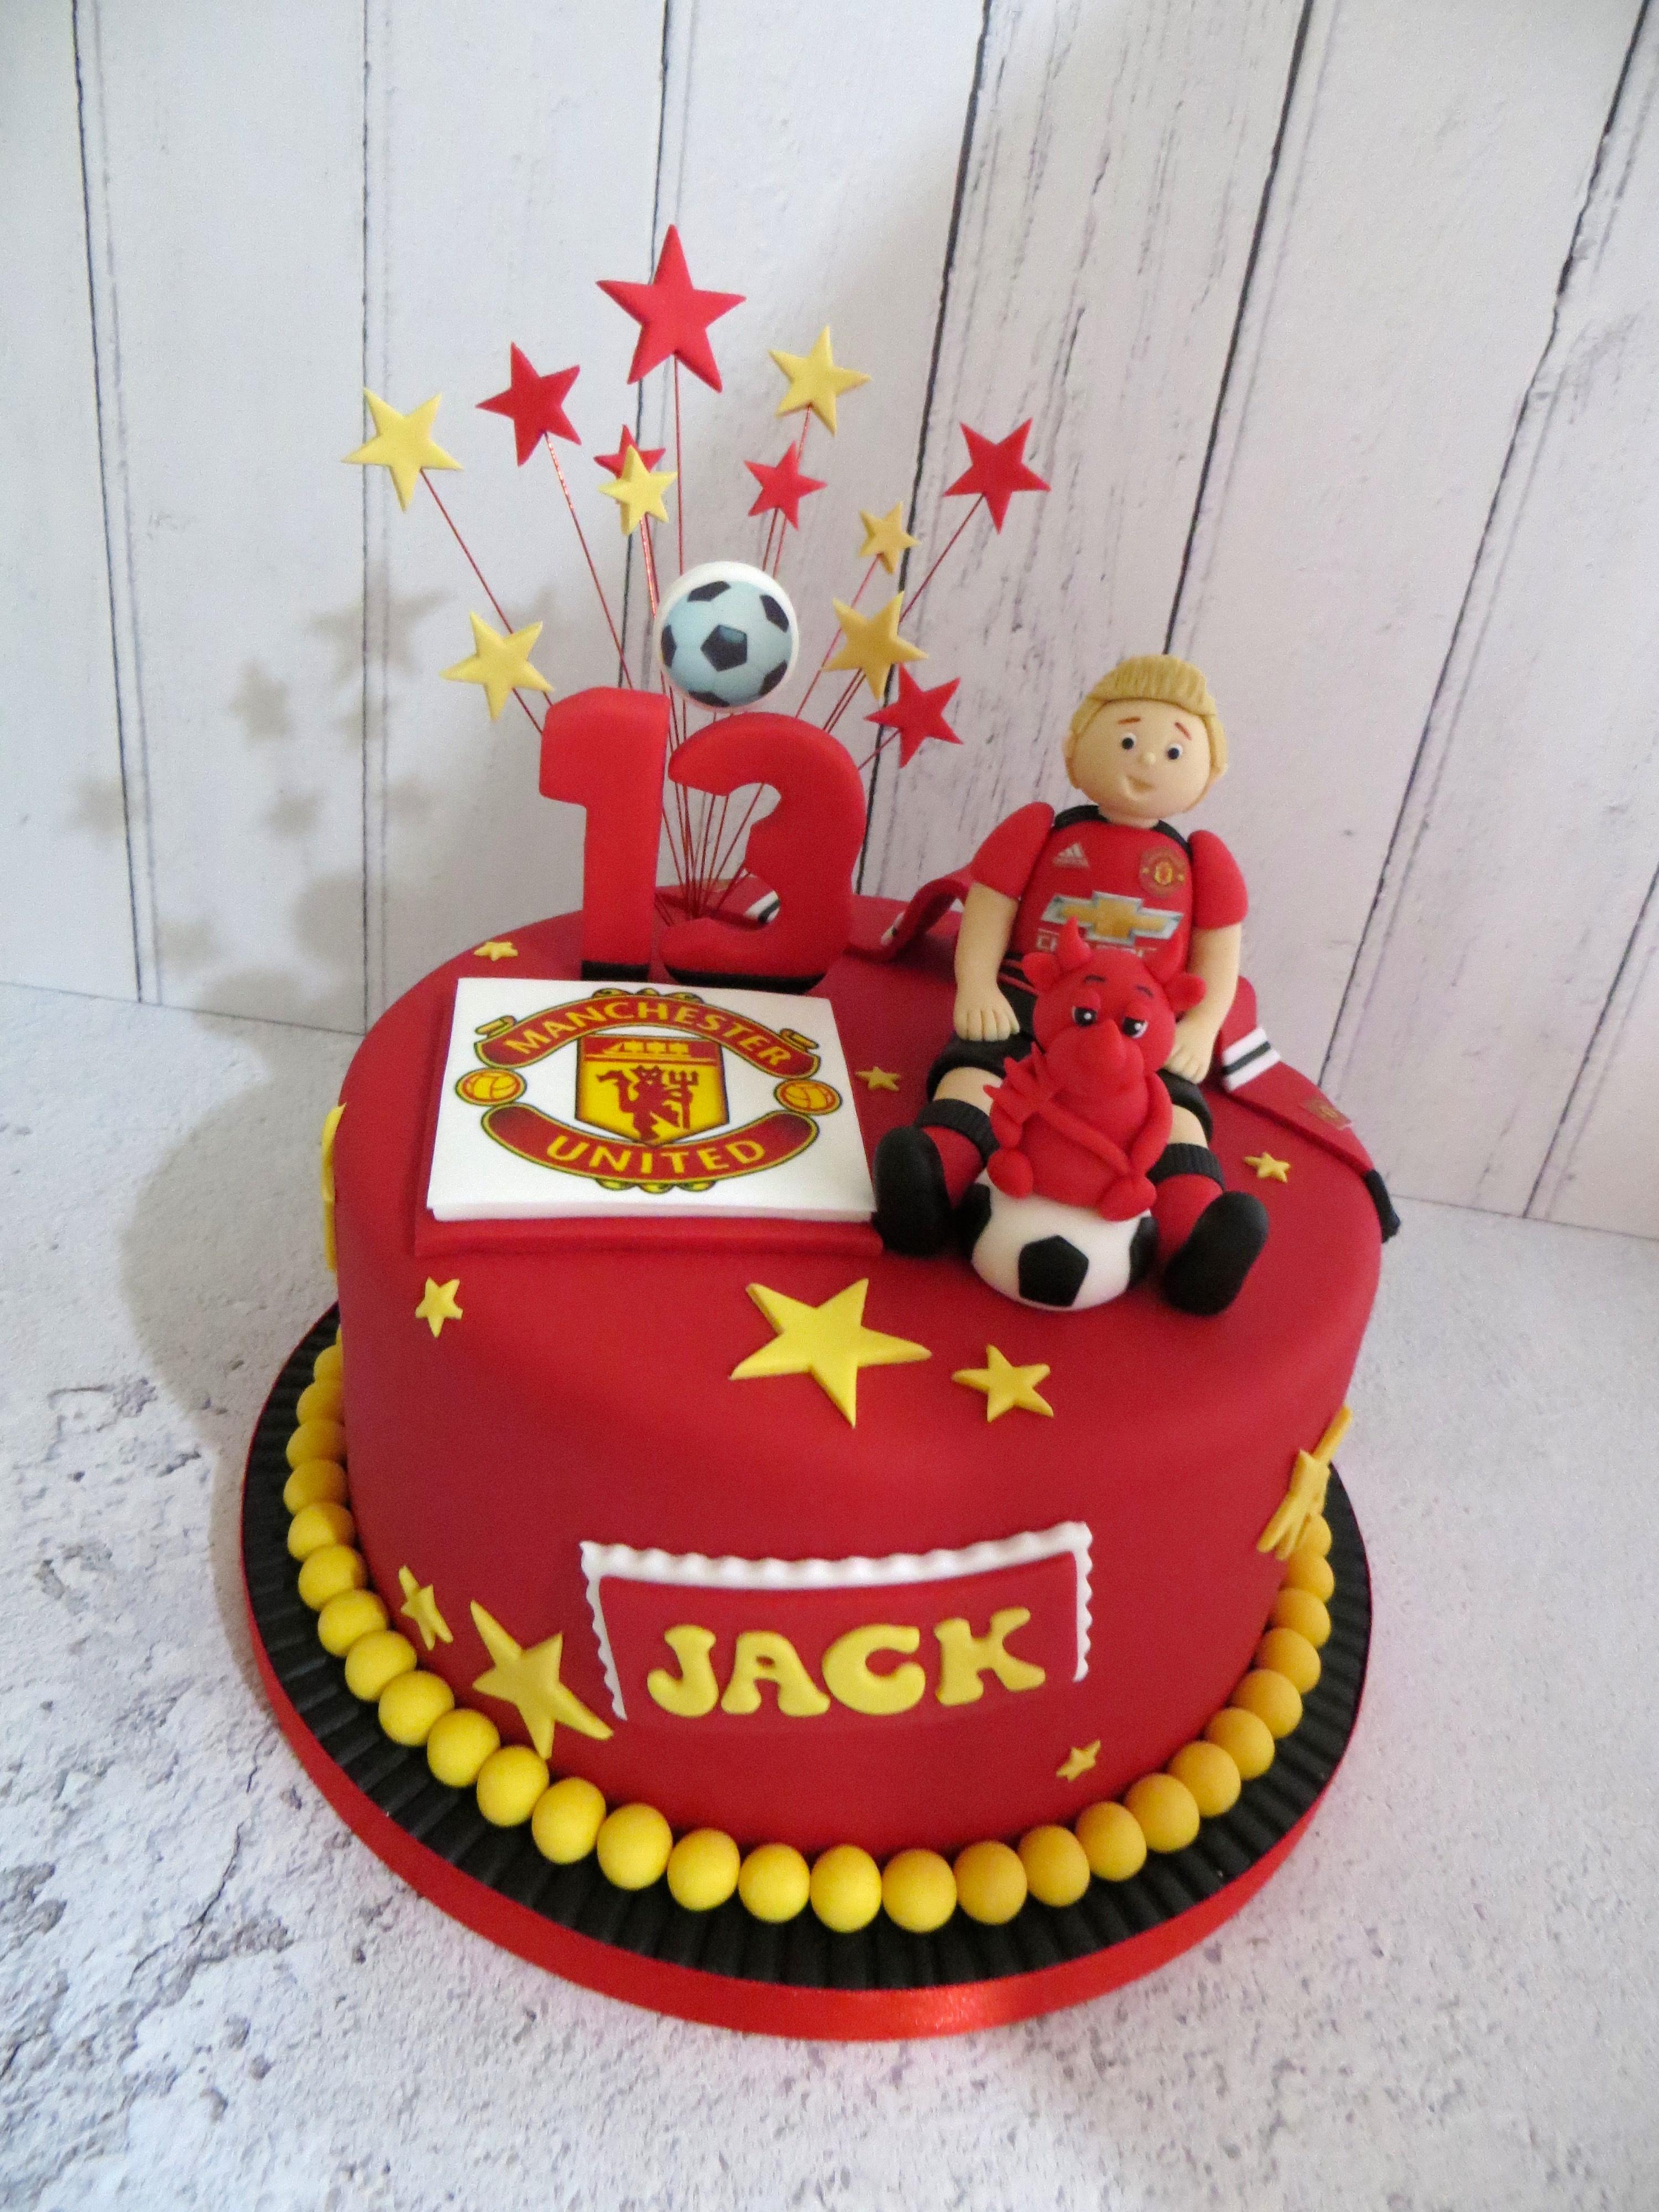 Awe Inspiring Manchester United Birthday Cake Birthday Cards Printable Nowaargucafe Filternl